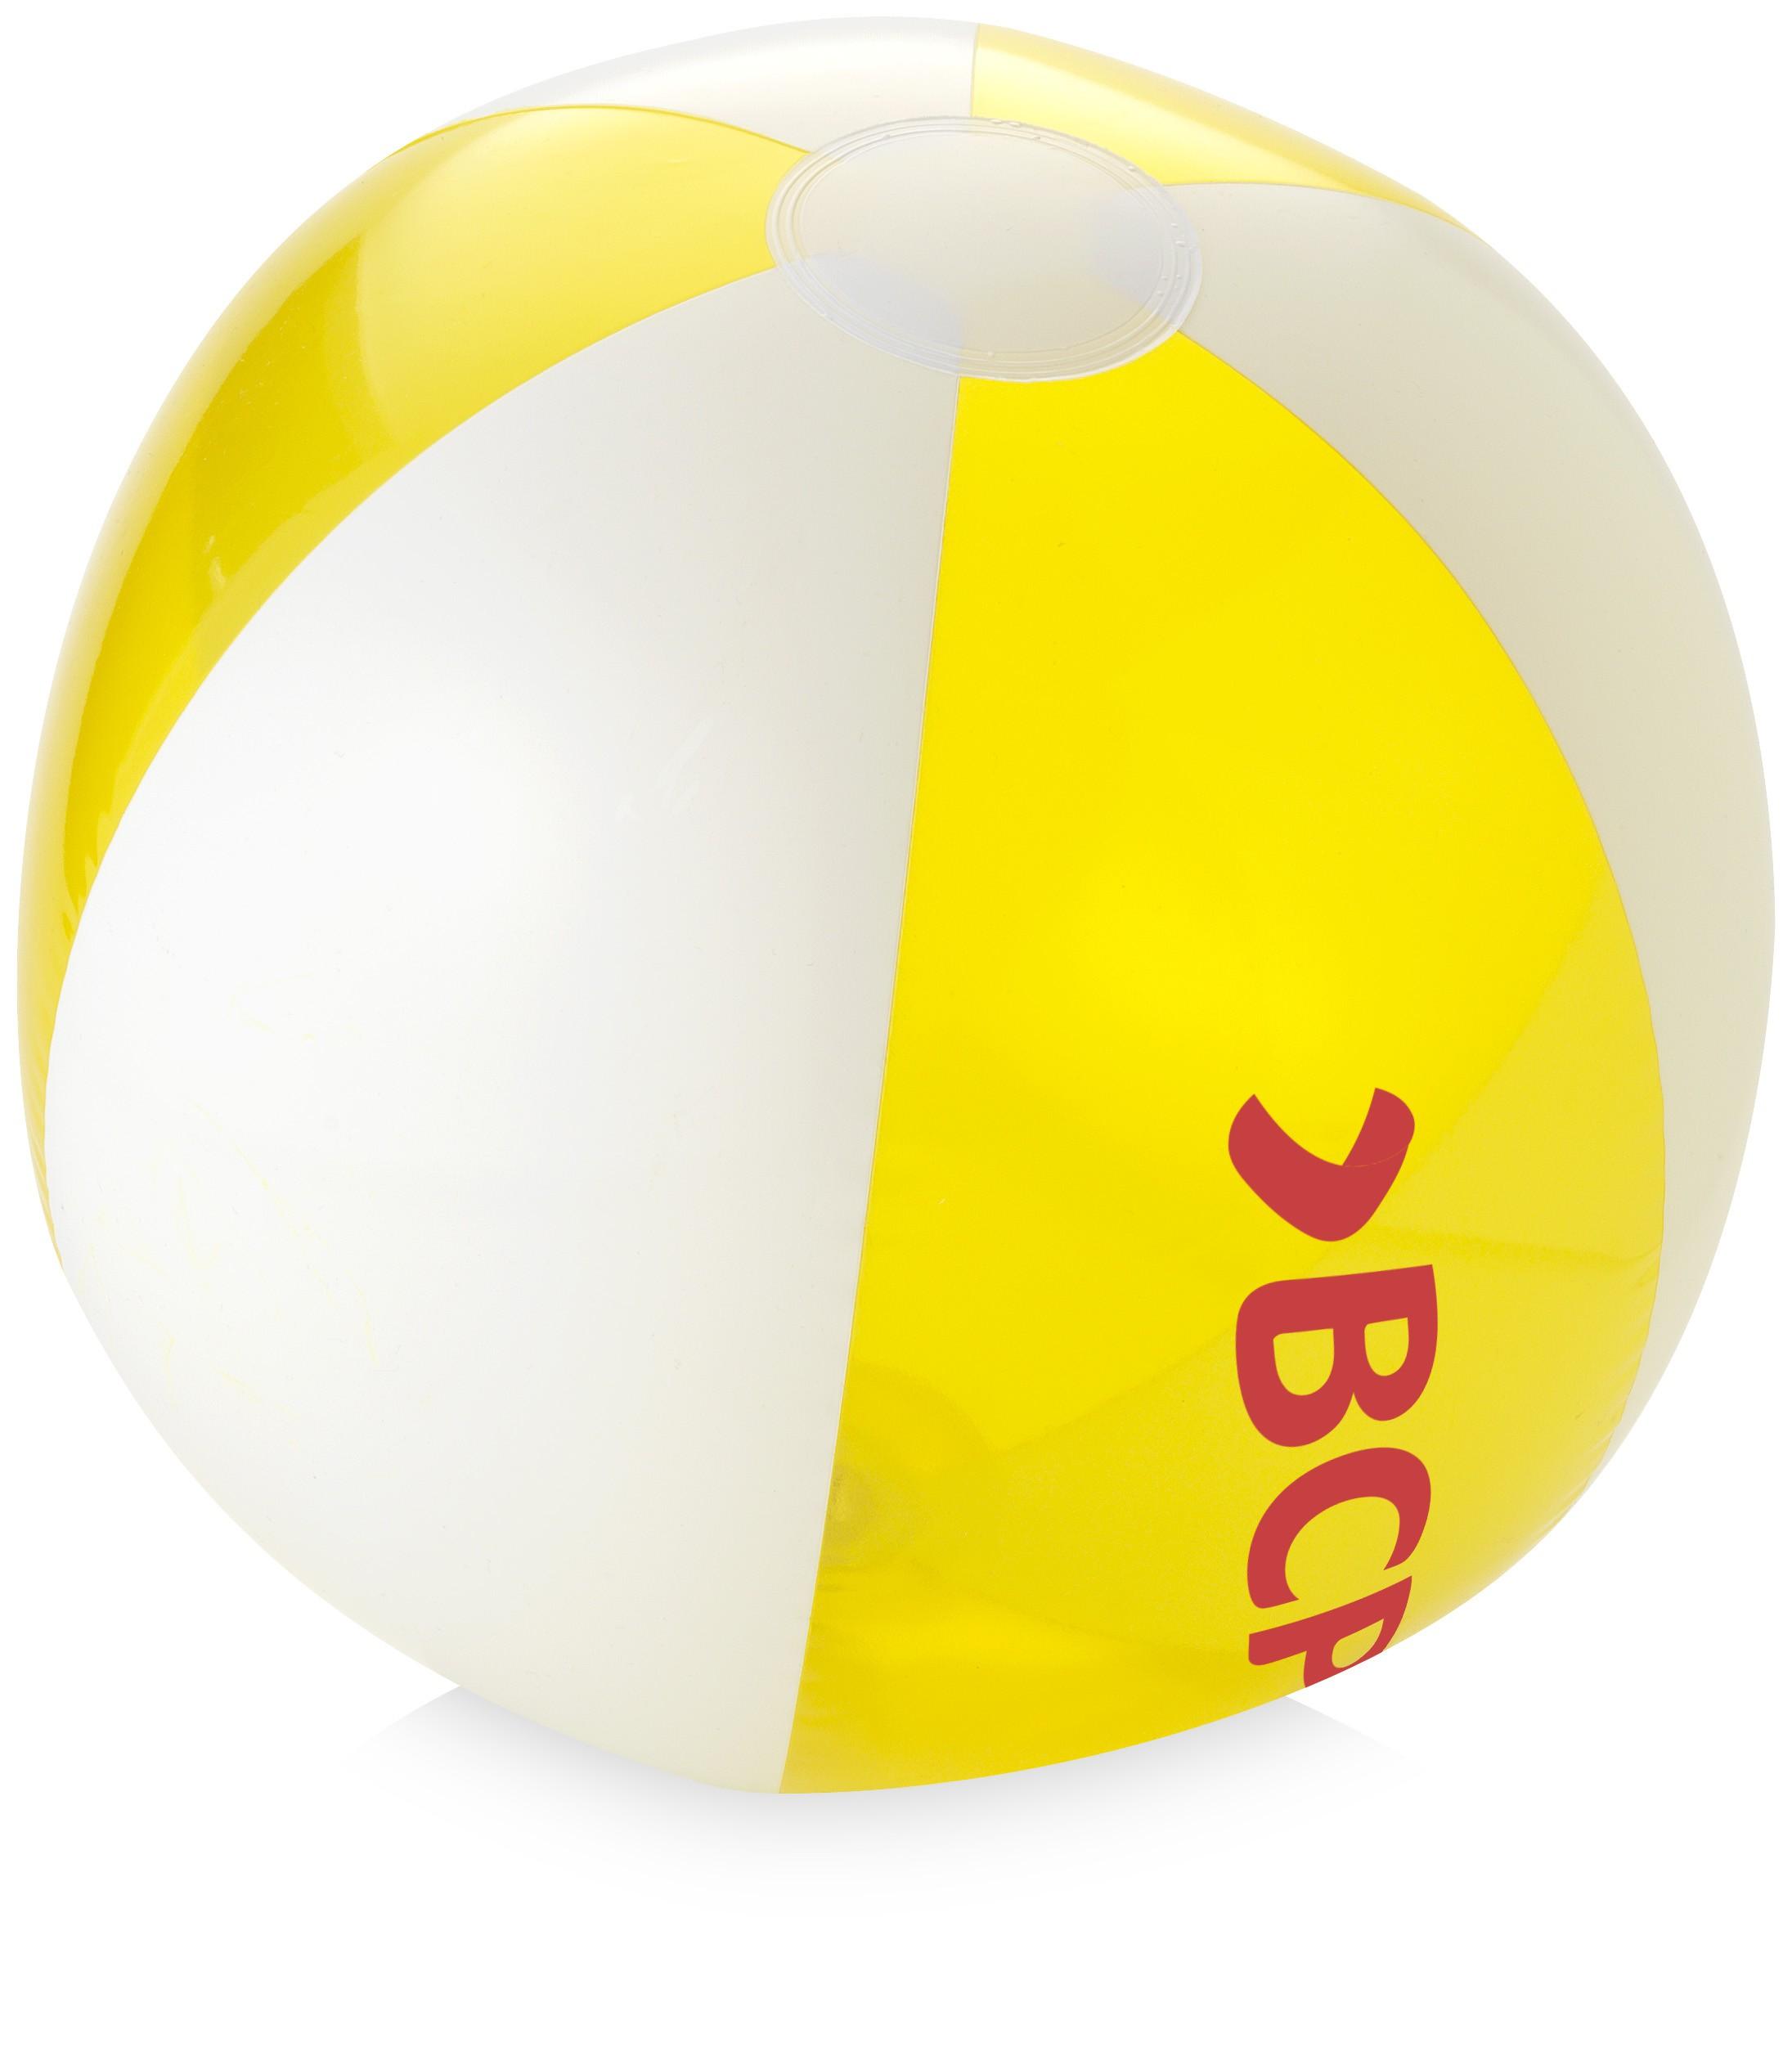 2191x2520 Bondi solidtransparent beach ball, transparent yellow (Inflatable